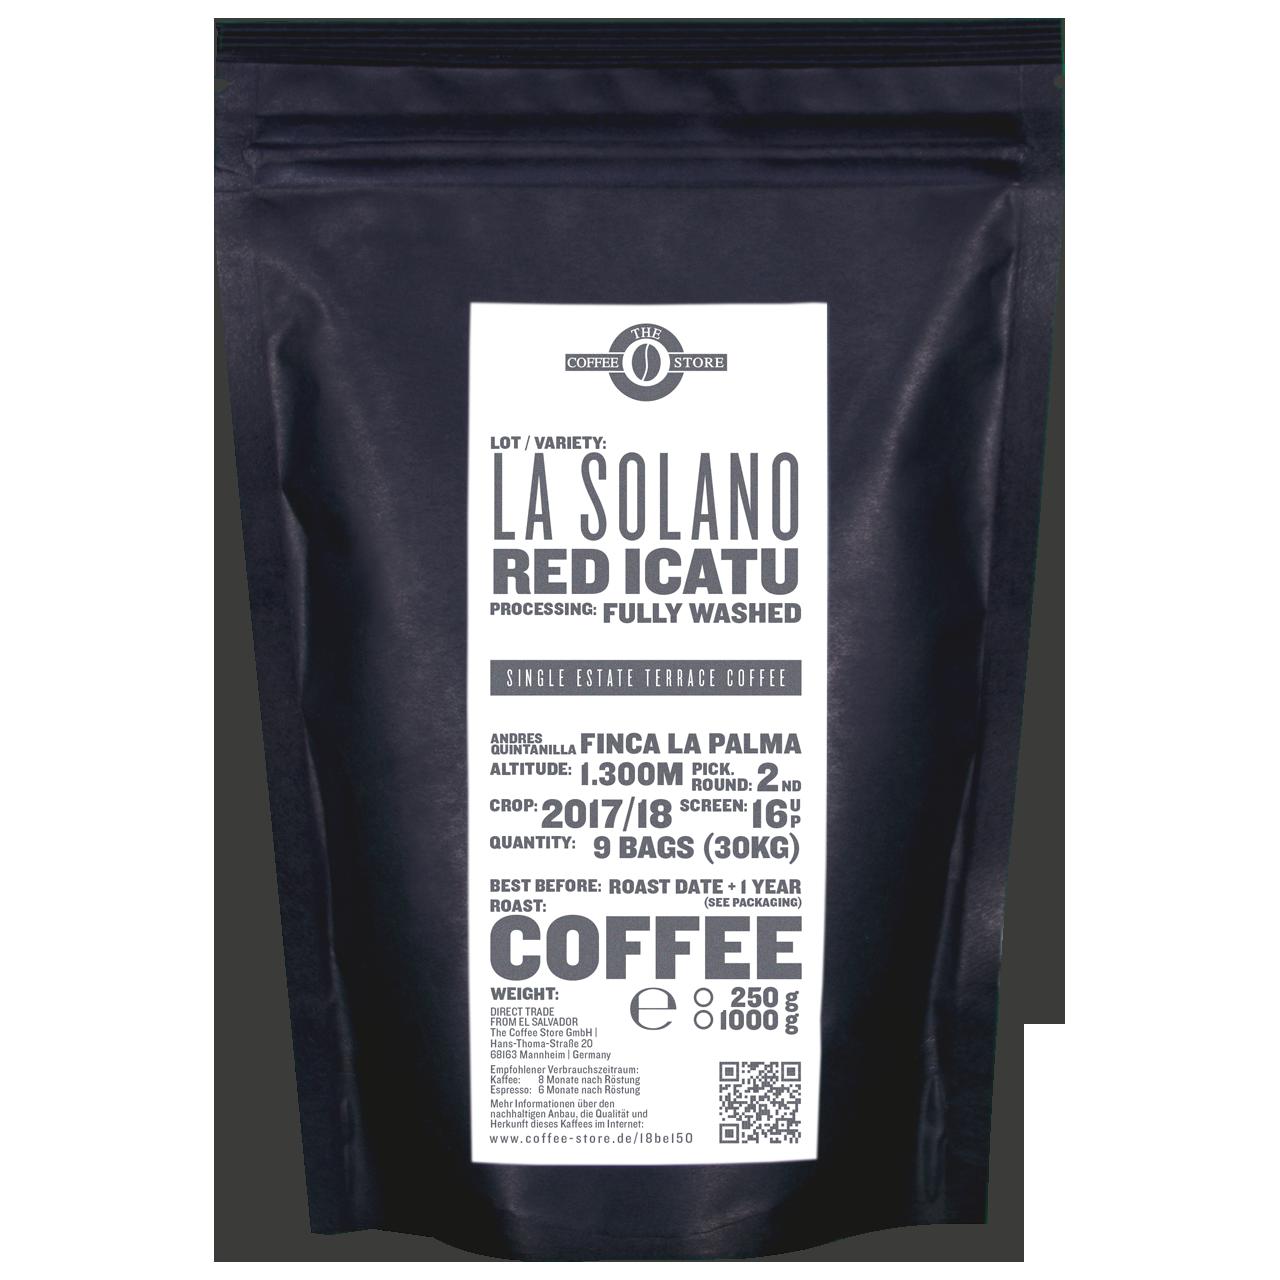 La Solano, Red Icatu - Kaffeeröstung